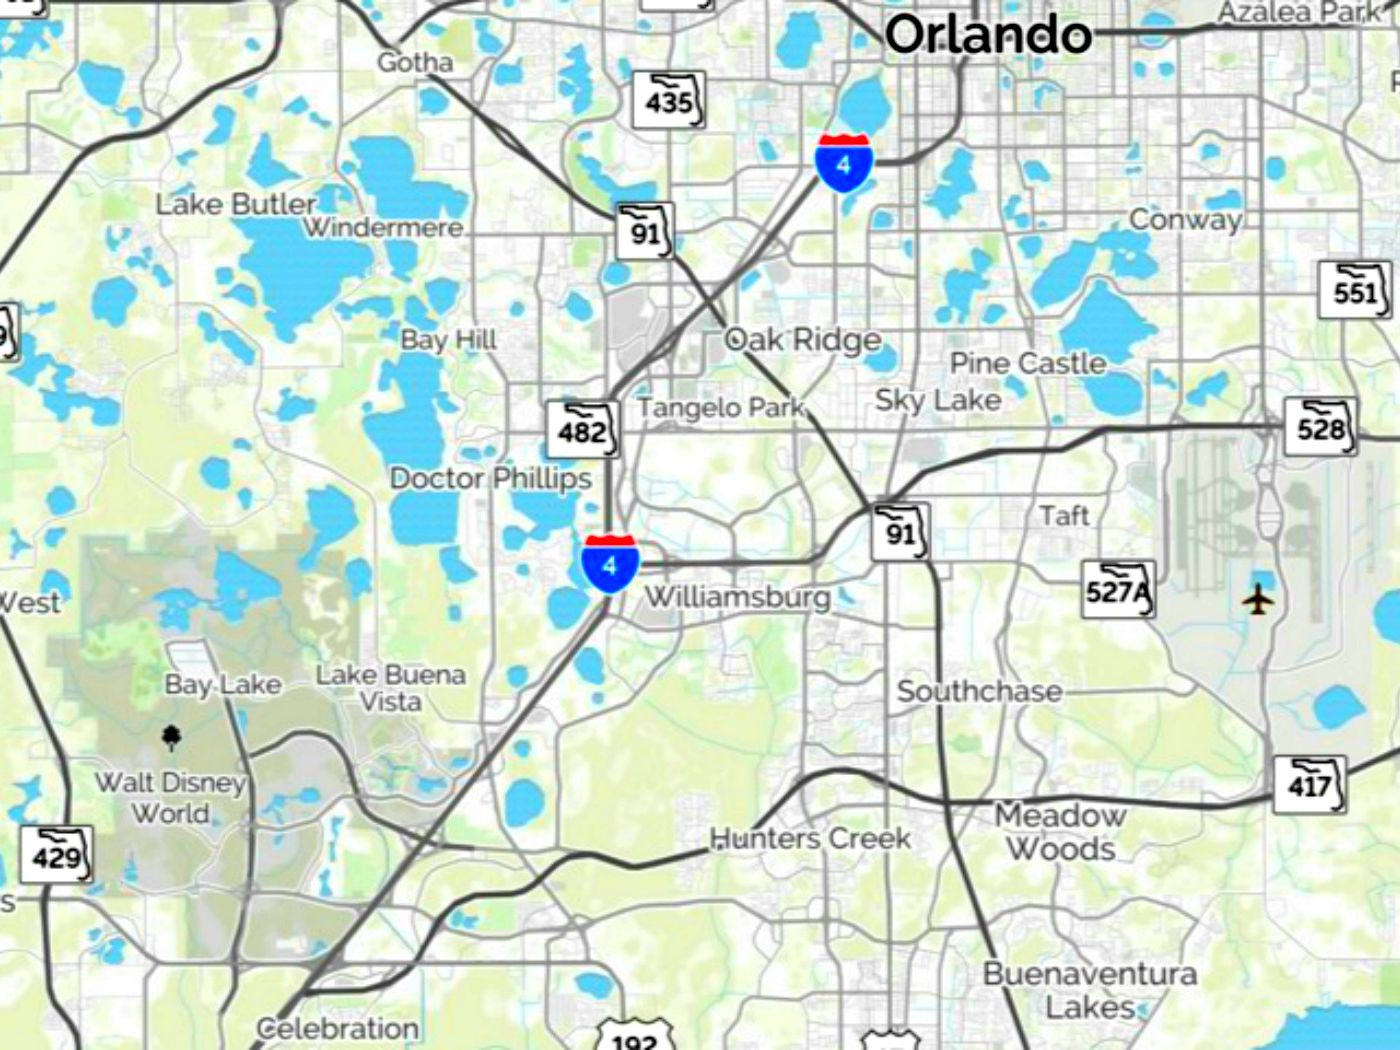 Map Of Florida Disney World Maps of Walt Disney World's Parks and Resorts